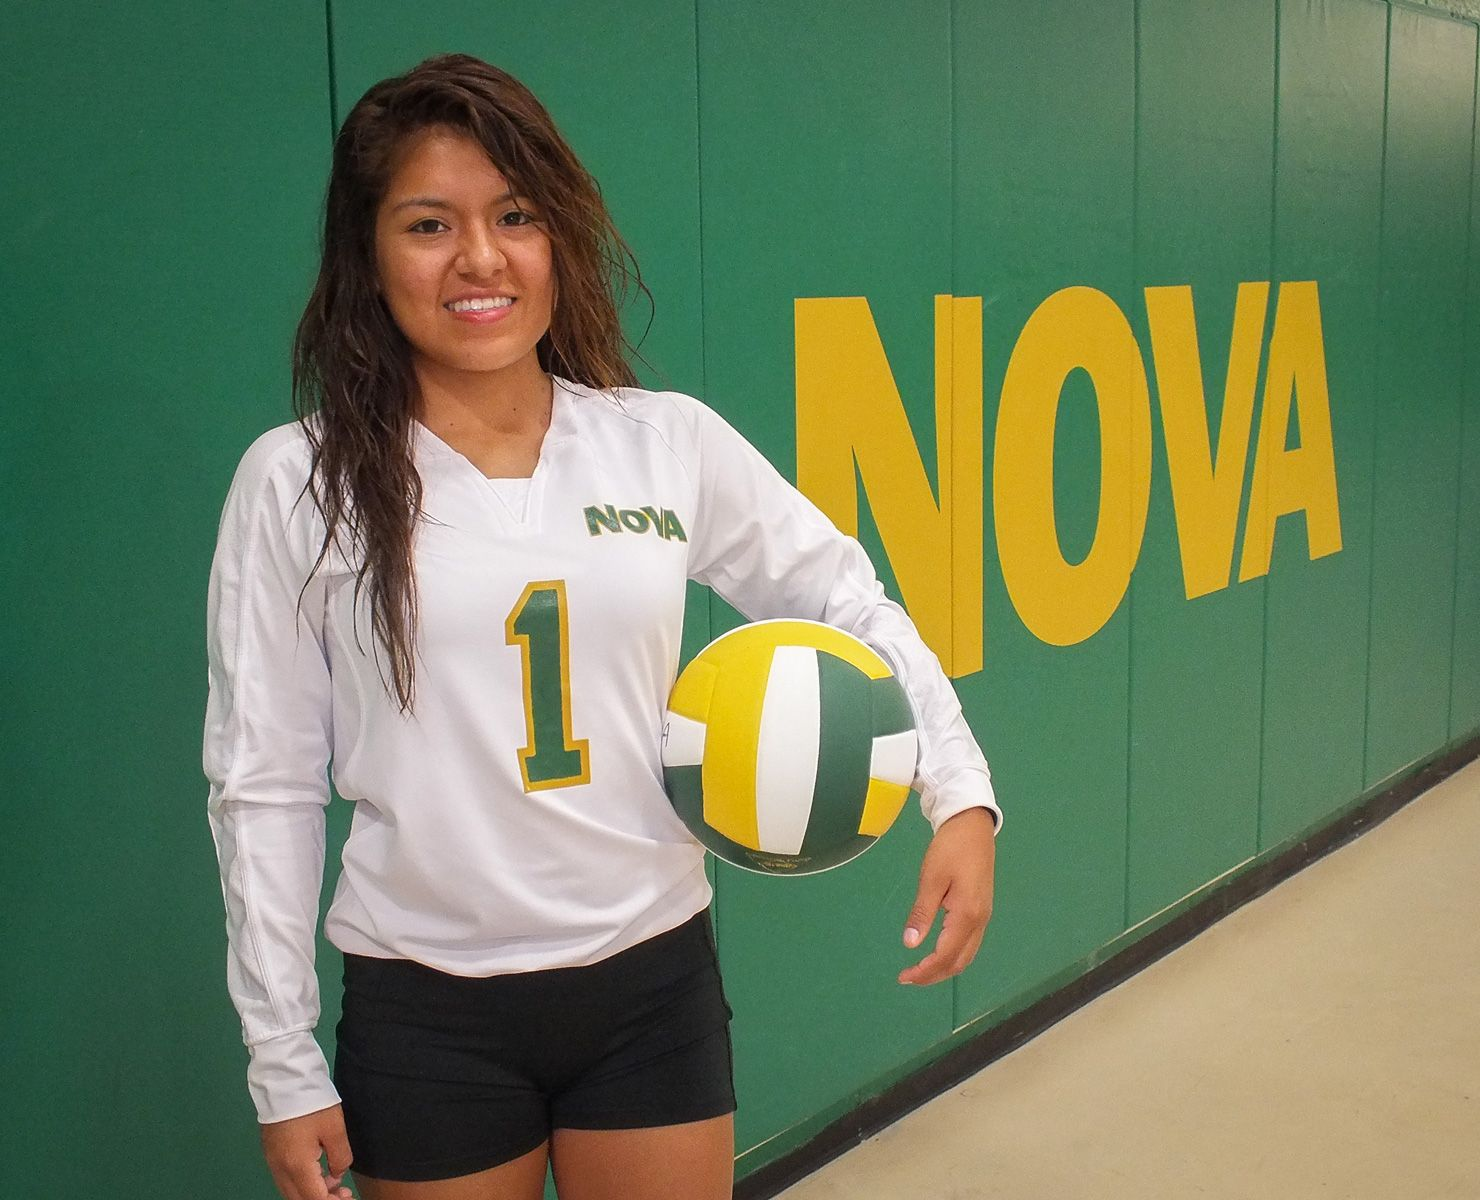 Northern Virginia Community College Nova Anita Rios Of The Nova Women S Volleyball Team Play Ball Volleyball Nova